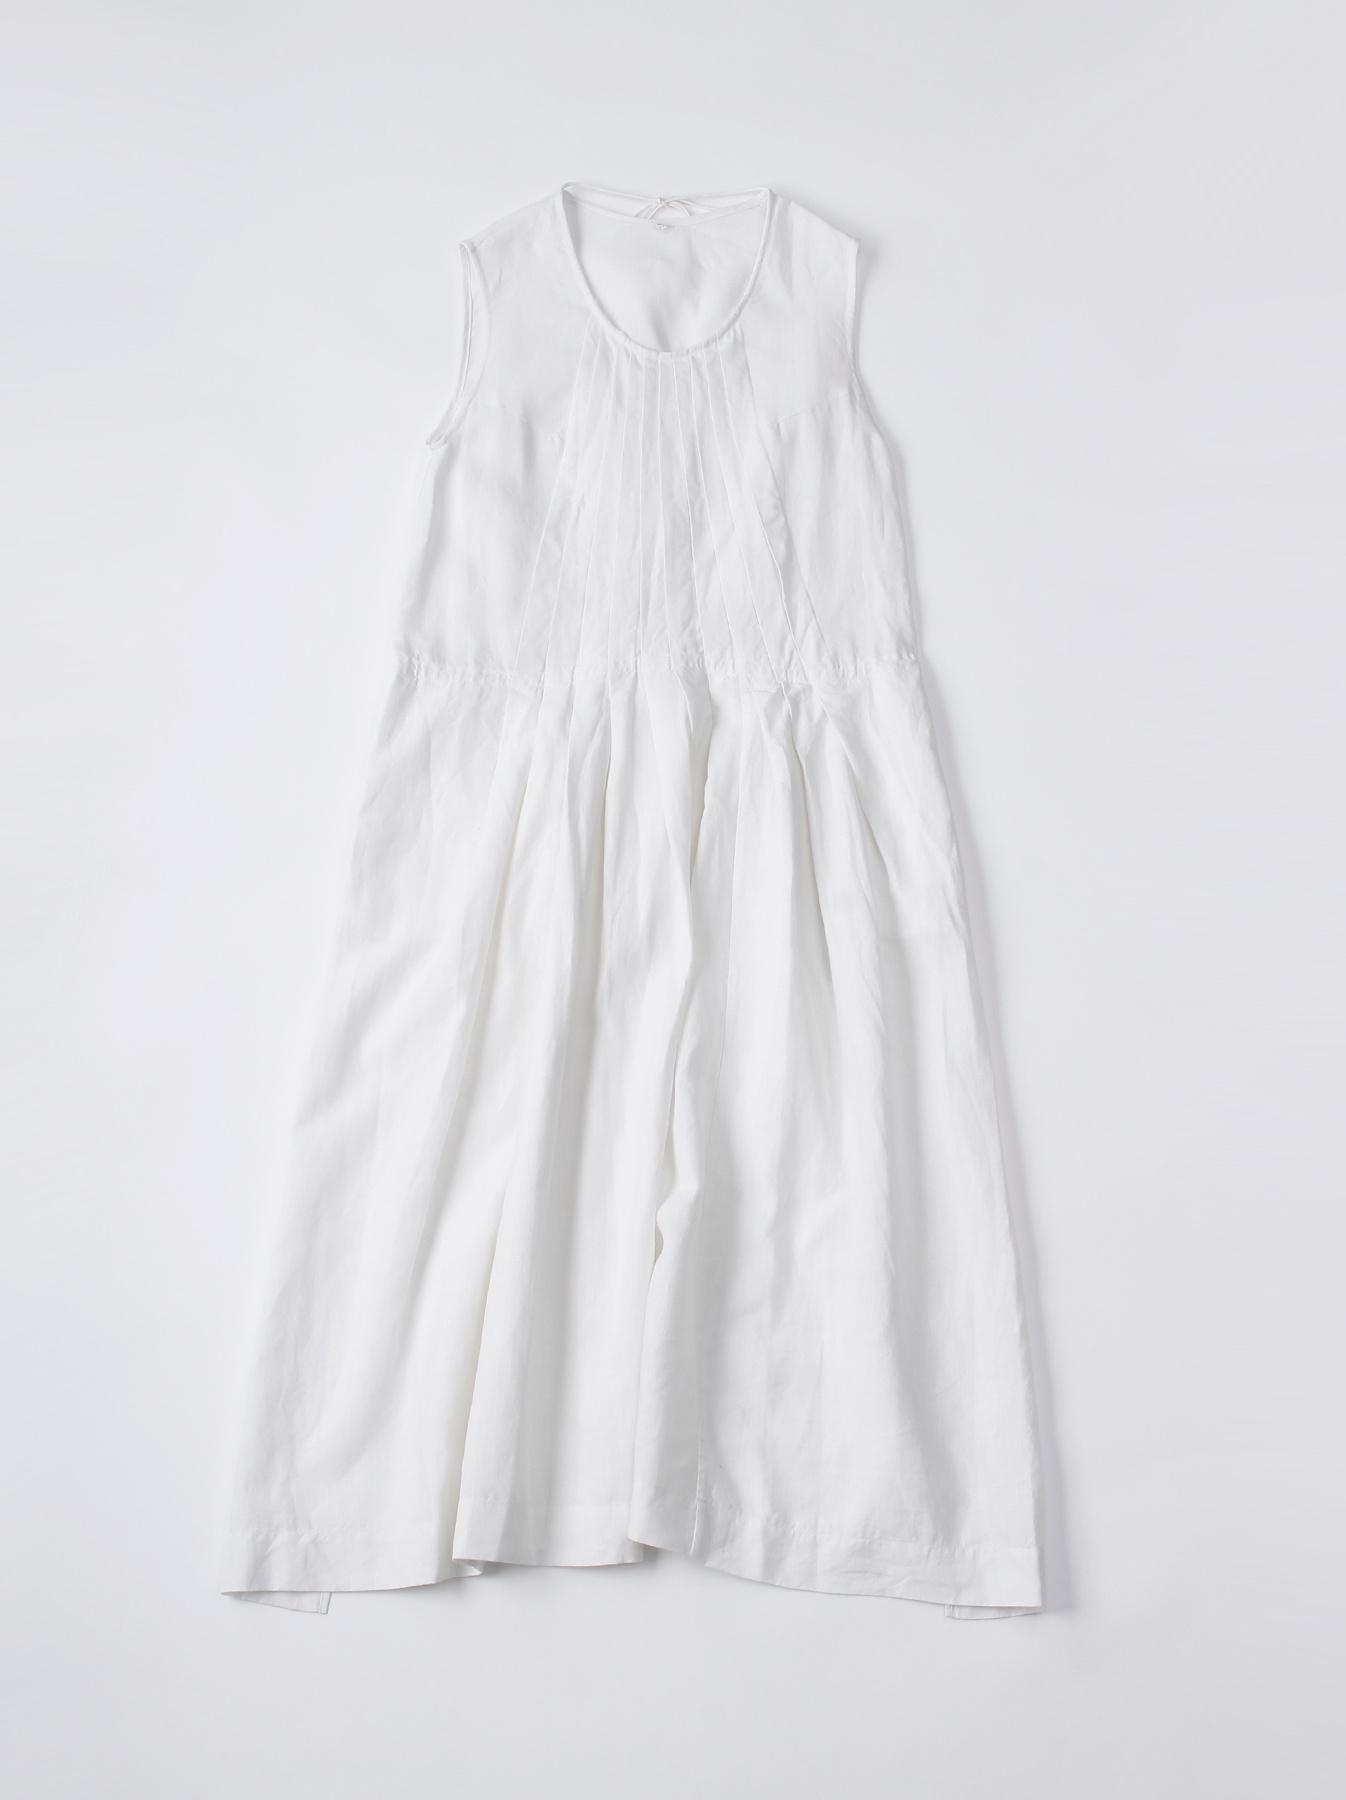 WH Linen Sleeveless Tuck Dress-1